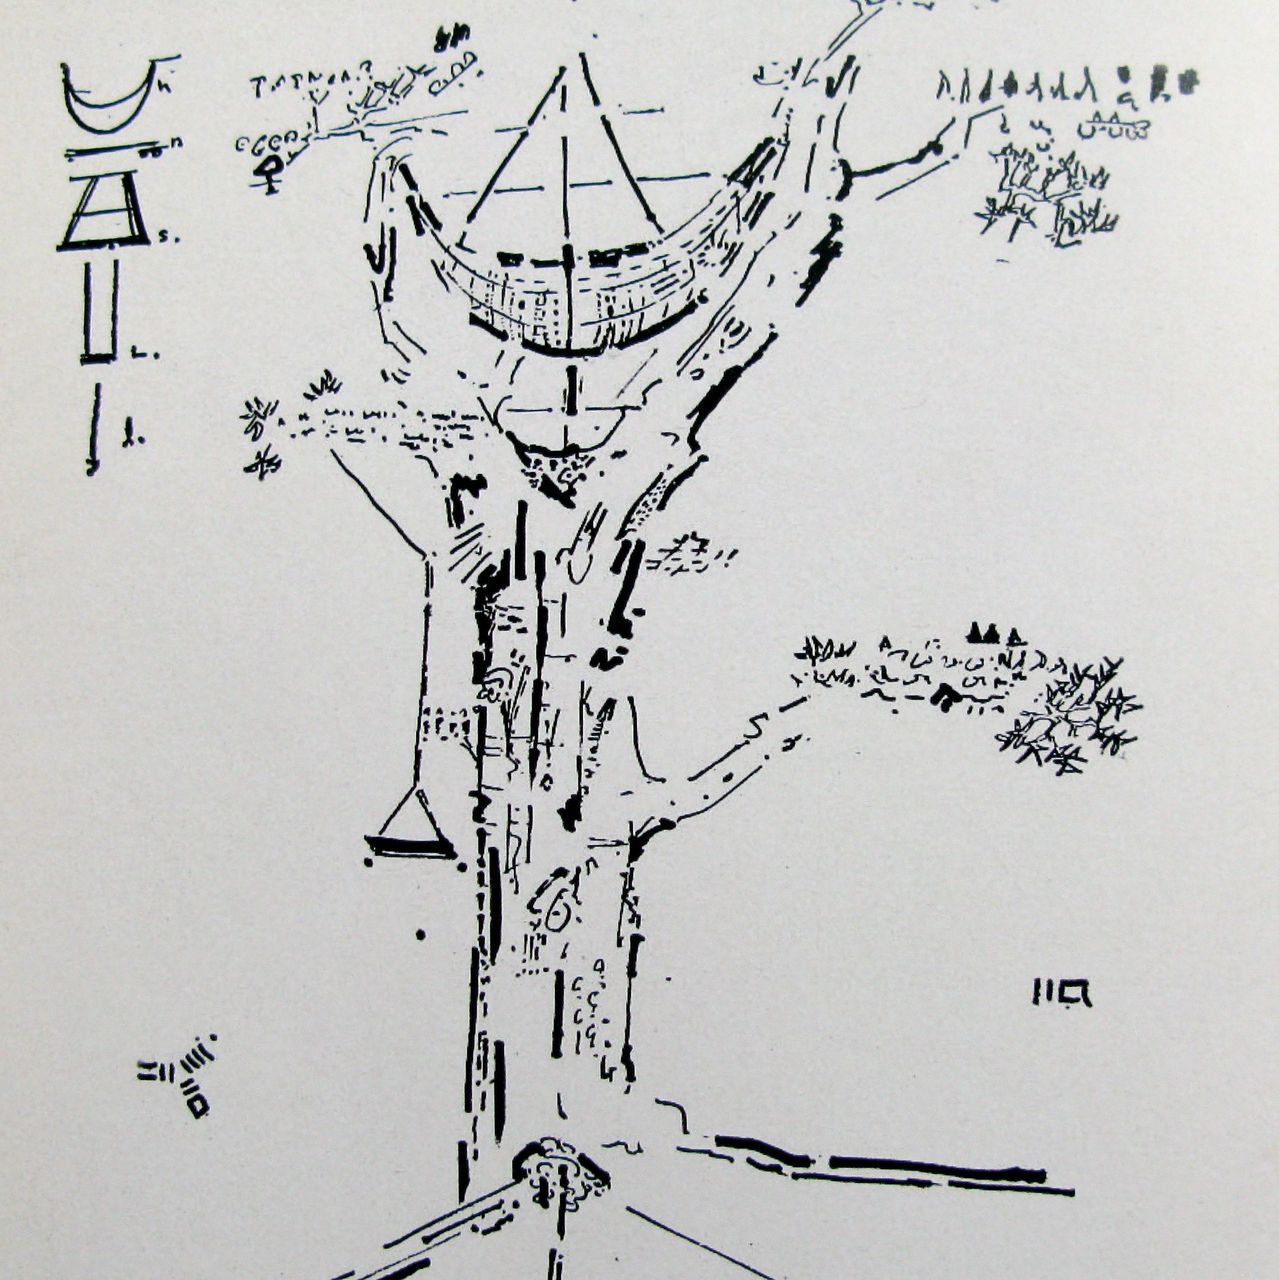 GORDON MATTACLARK Tree House or Tree Dance 1971 Pencil